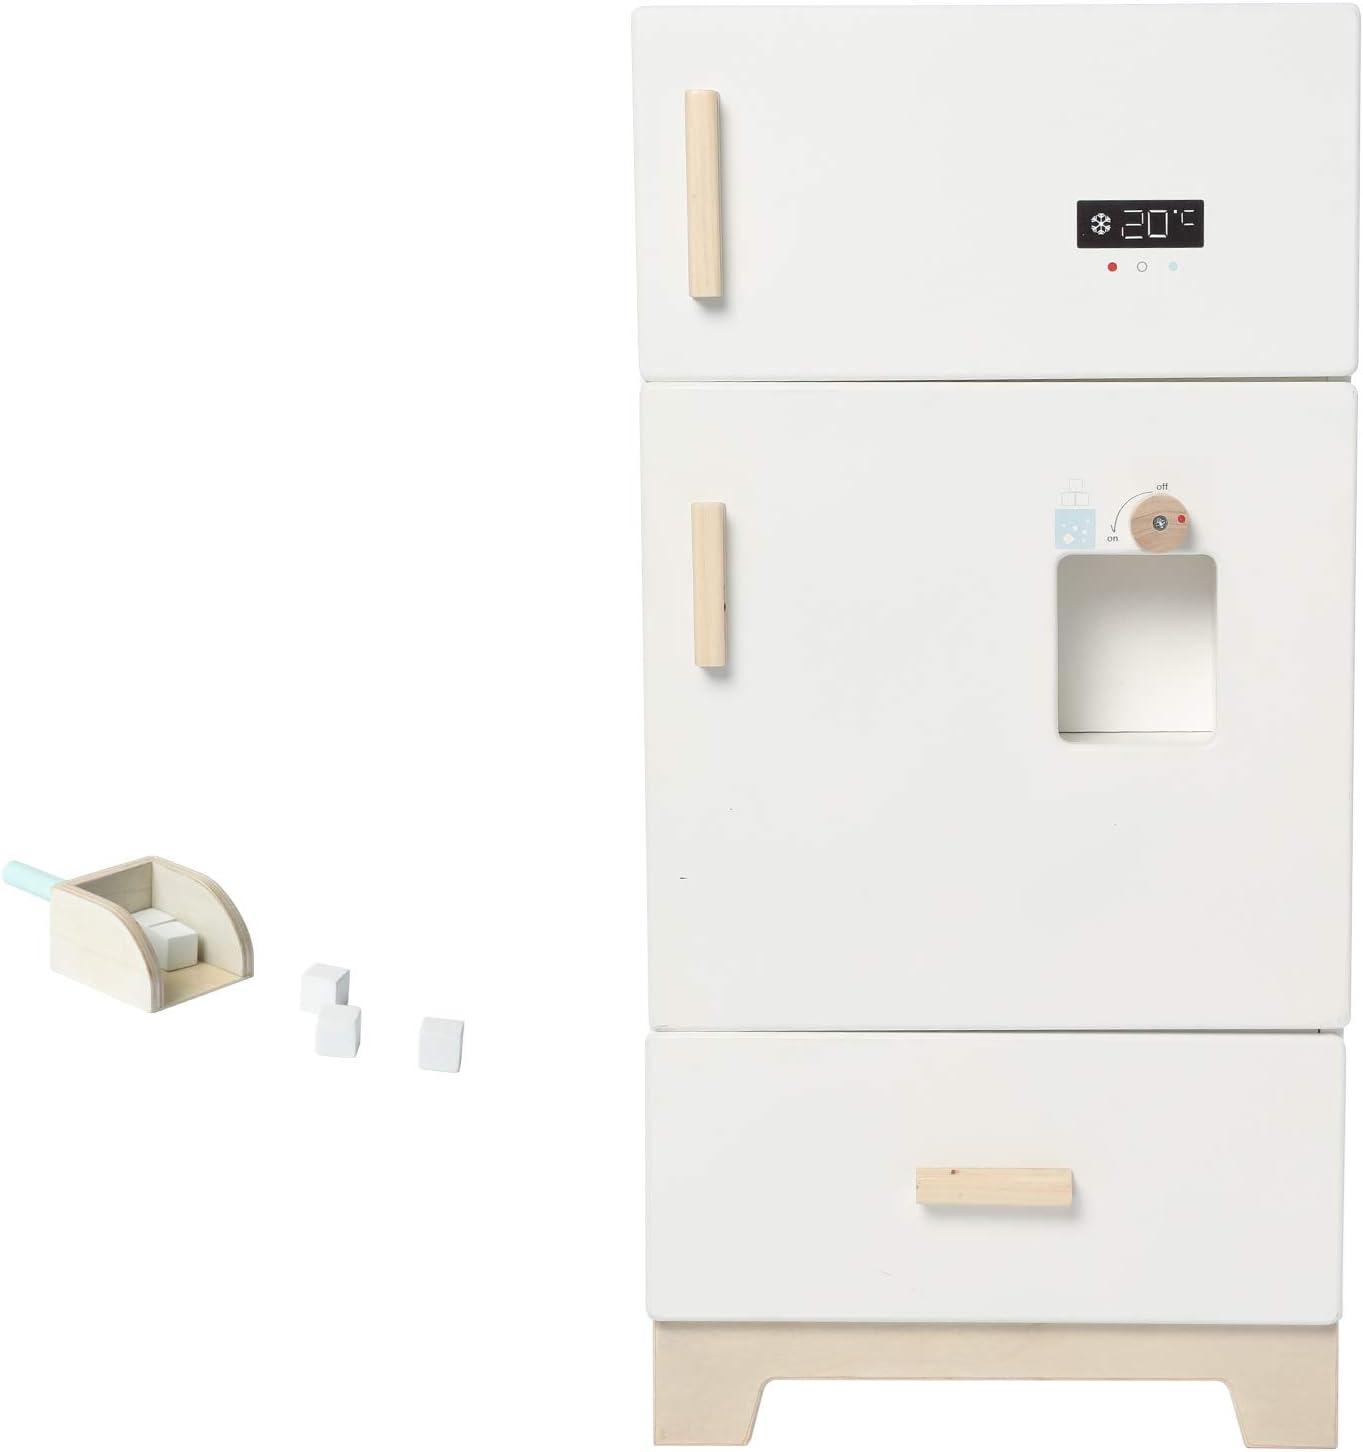 labebe - Kitchen Wooden Fridge | Fridge Freezer for Toddlers, Kids' Kitchen Playset Toy, Baby Cabinet Refrigerator Pretend Play Furniture White for Children Boy & Girl(15.8